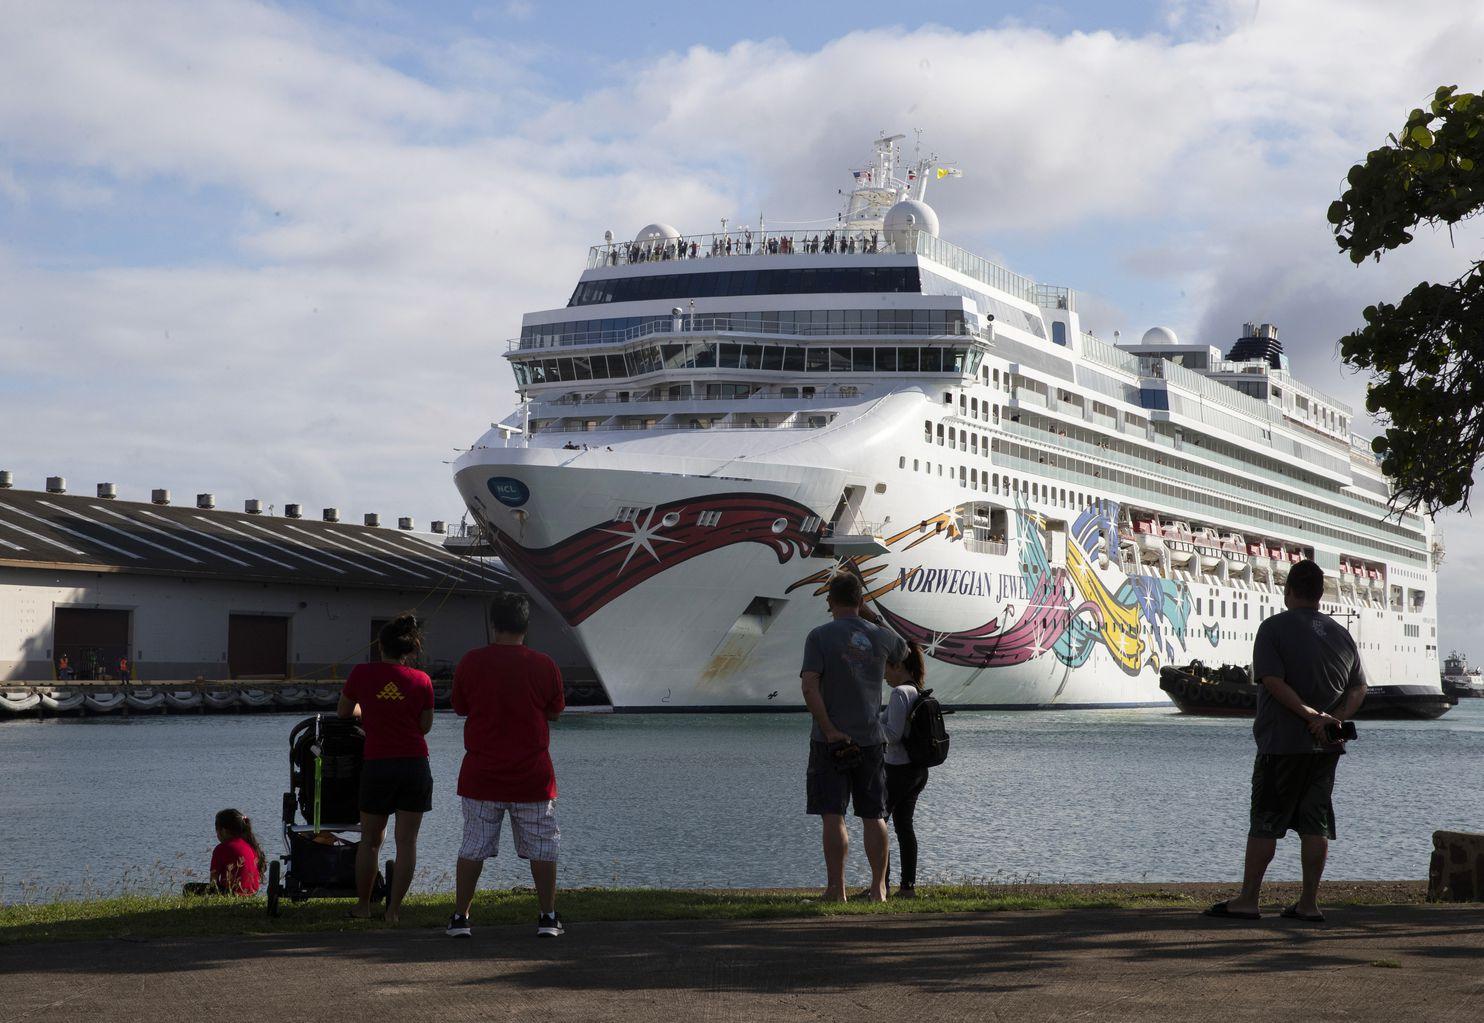 Norwegian Jewel cruise passengers allowed to disembark in Hawaii to travel home